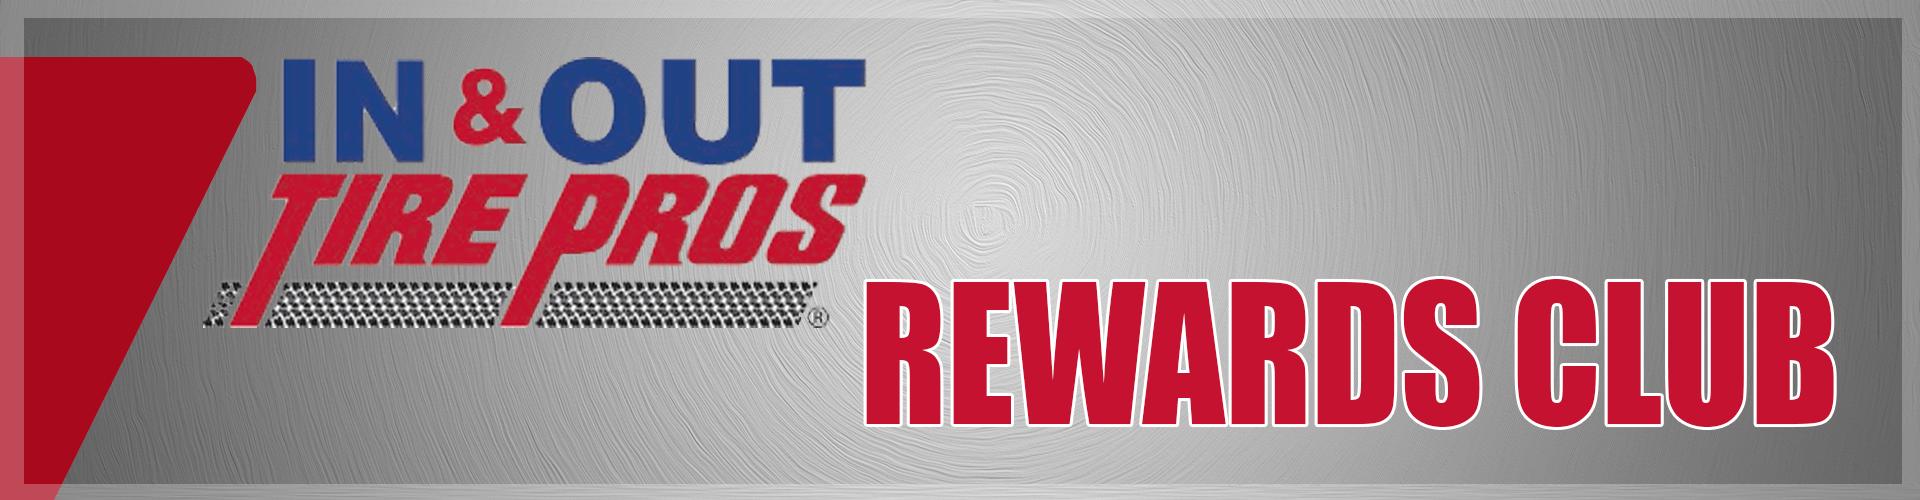 Rewards Club Header